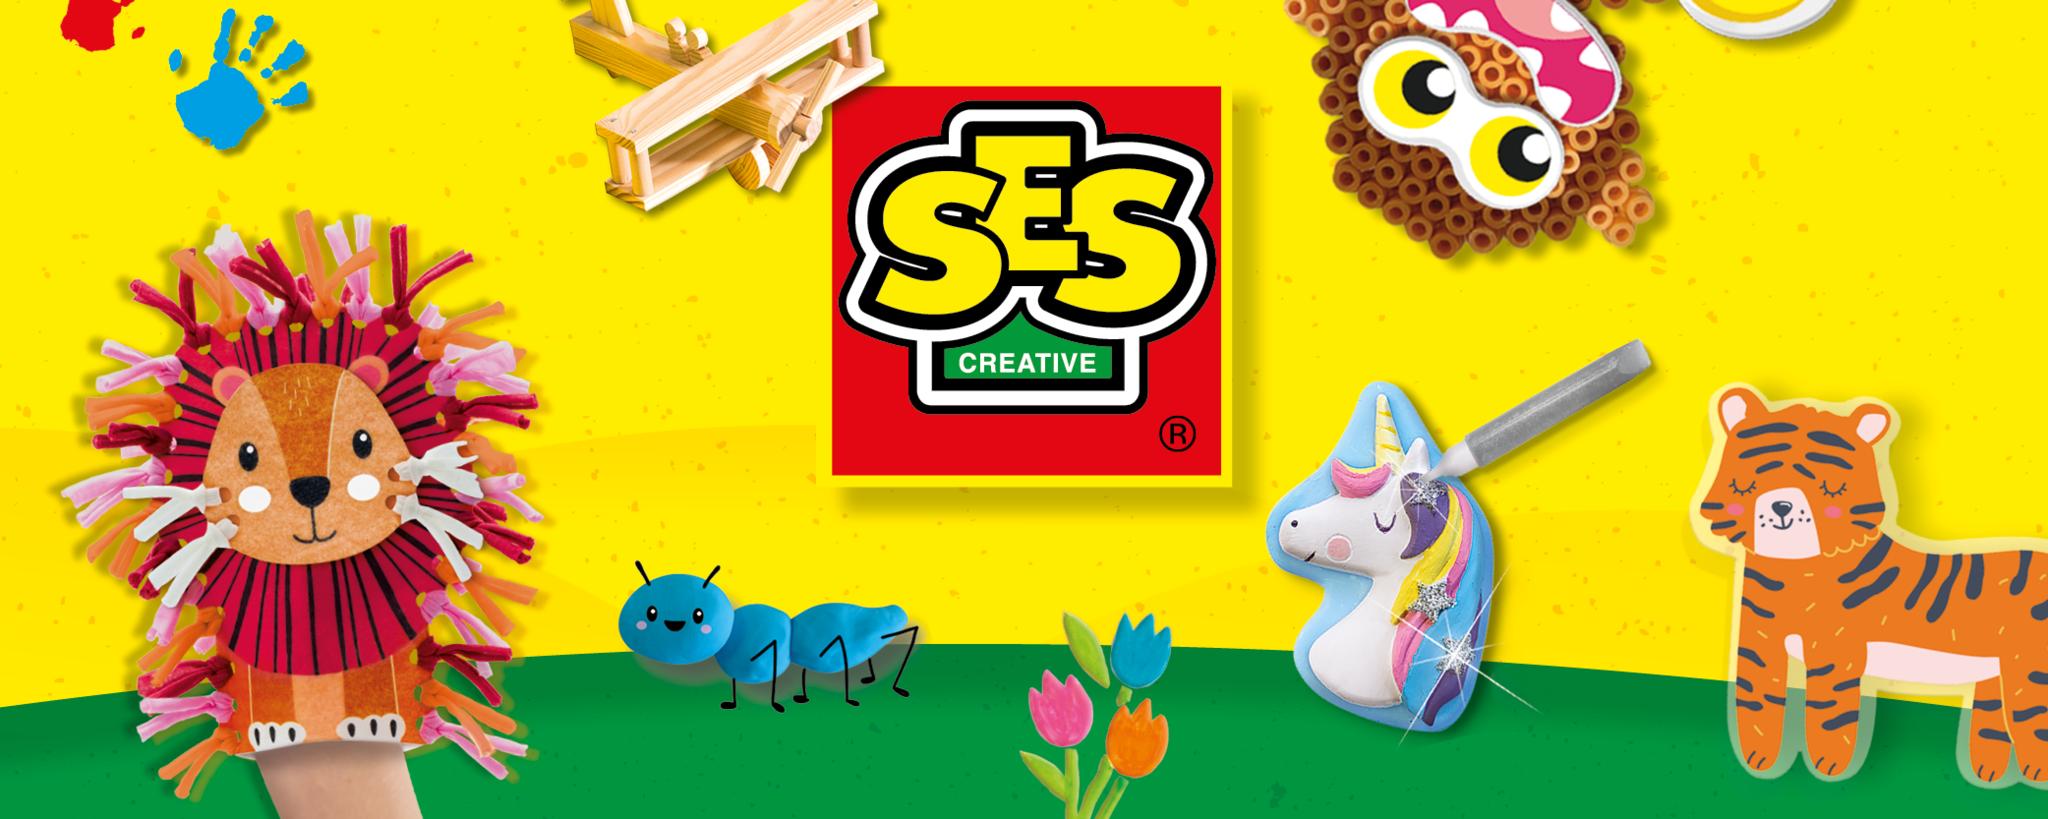 SES Creative -creative toys